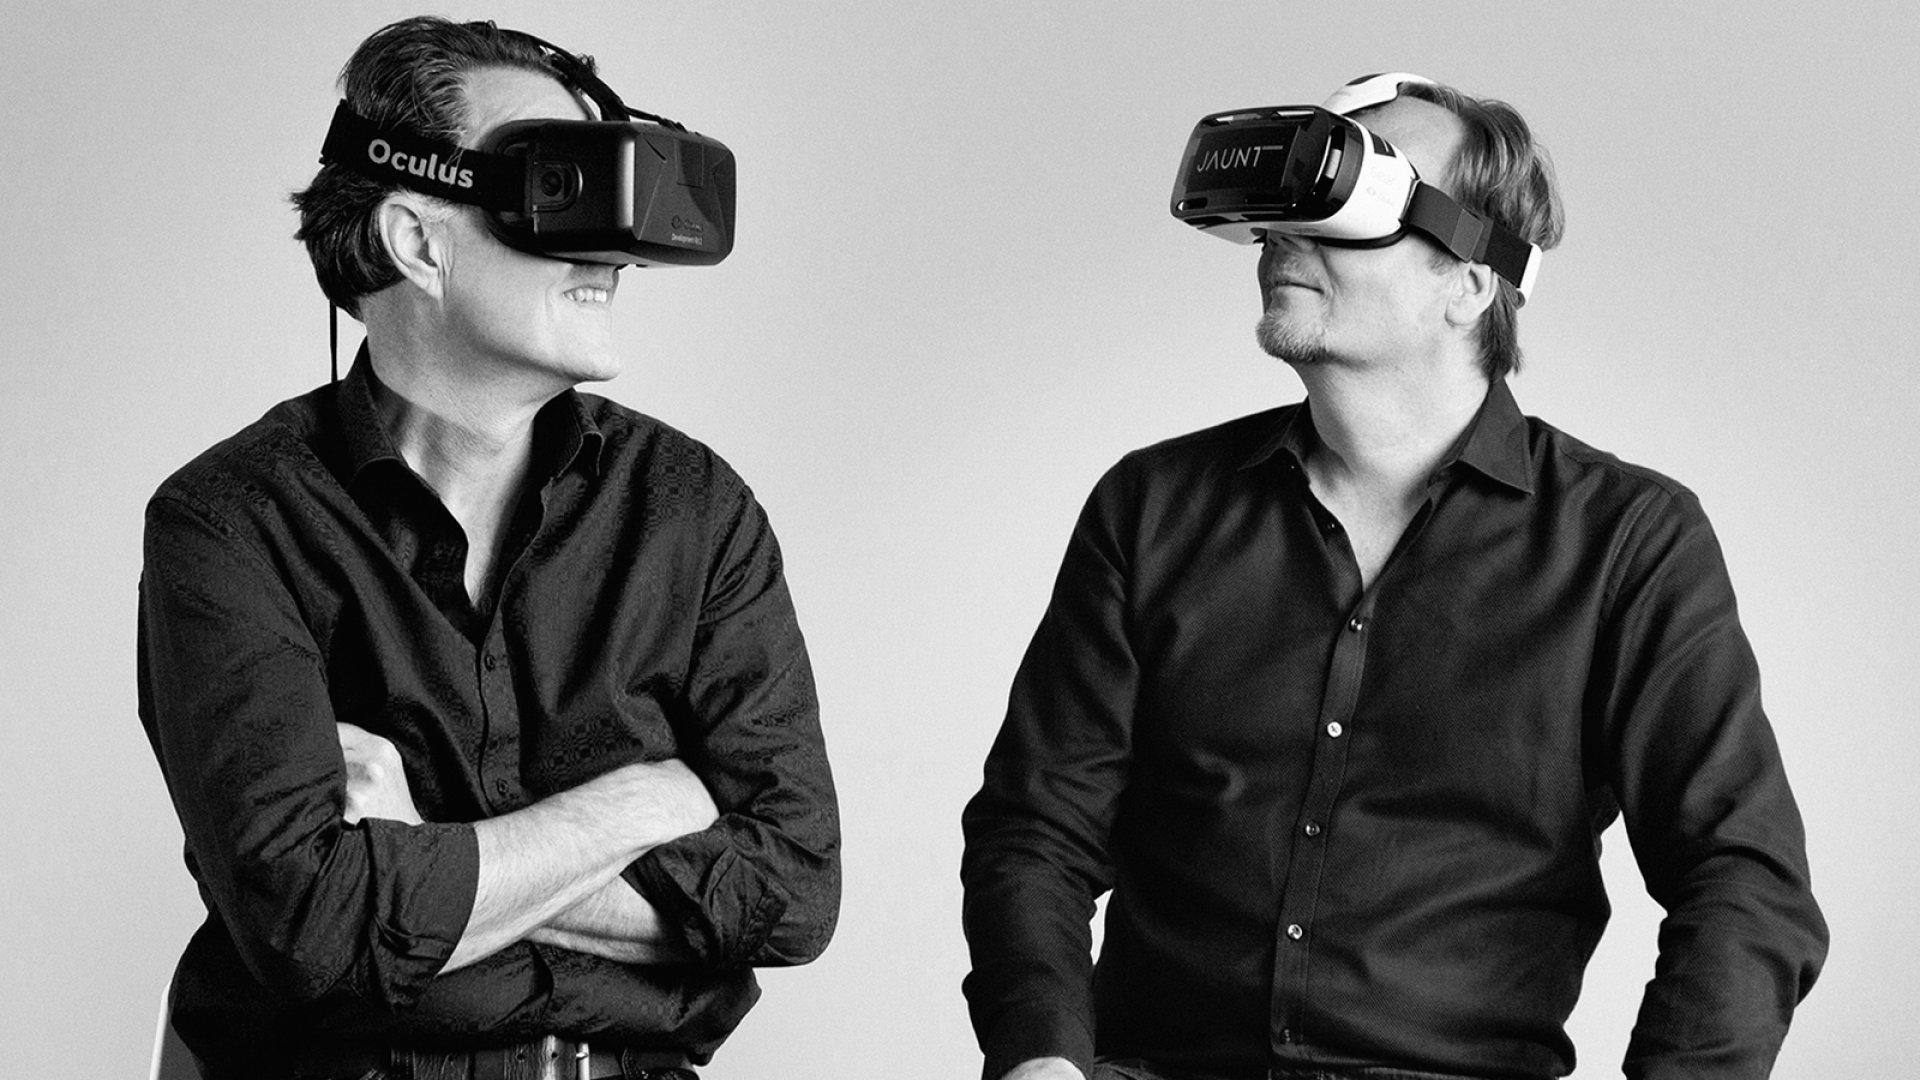 Jaunt co-founders Arthur Van Hoff and Jens Christensen.